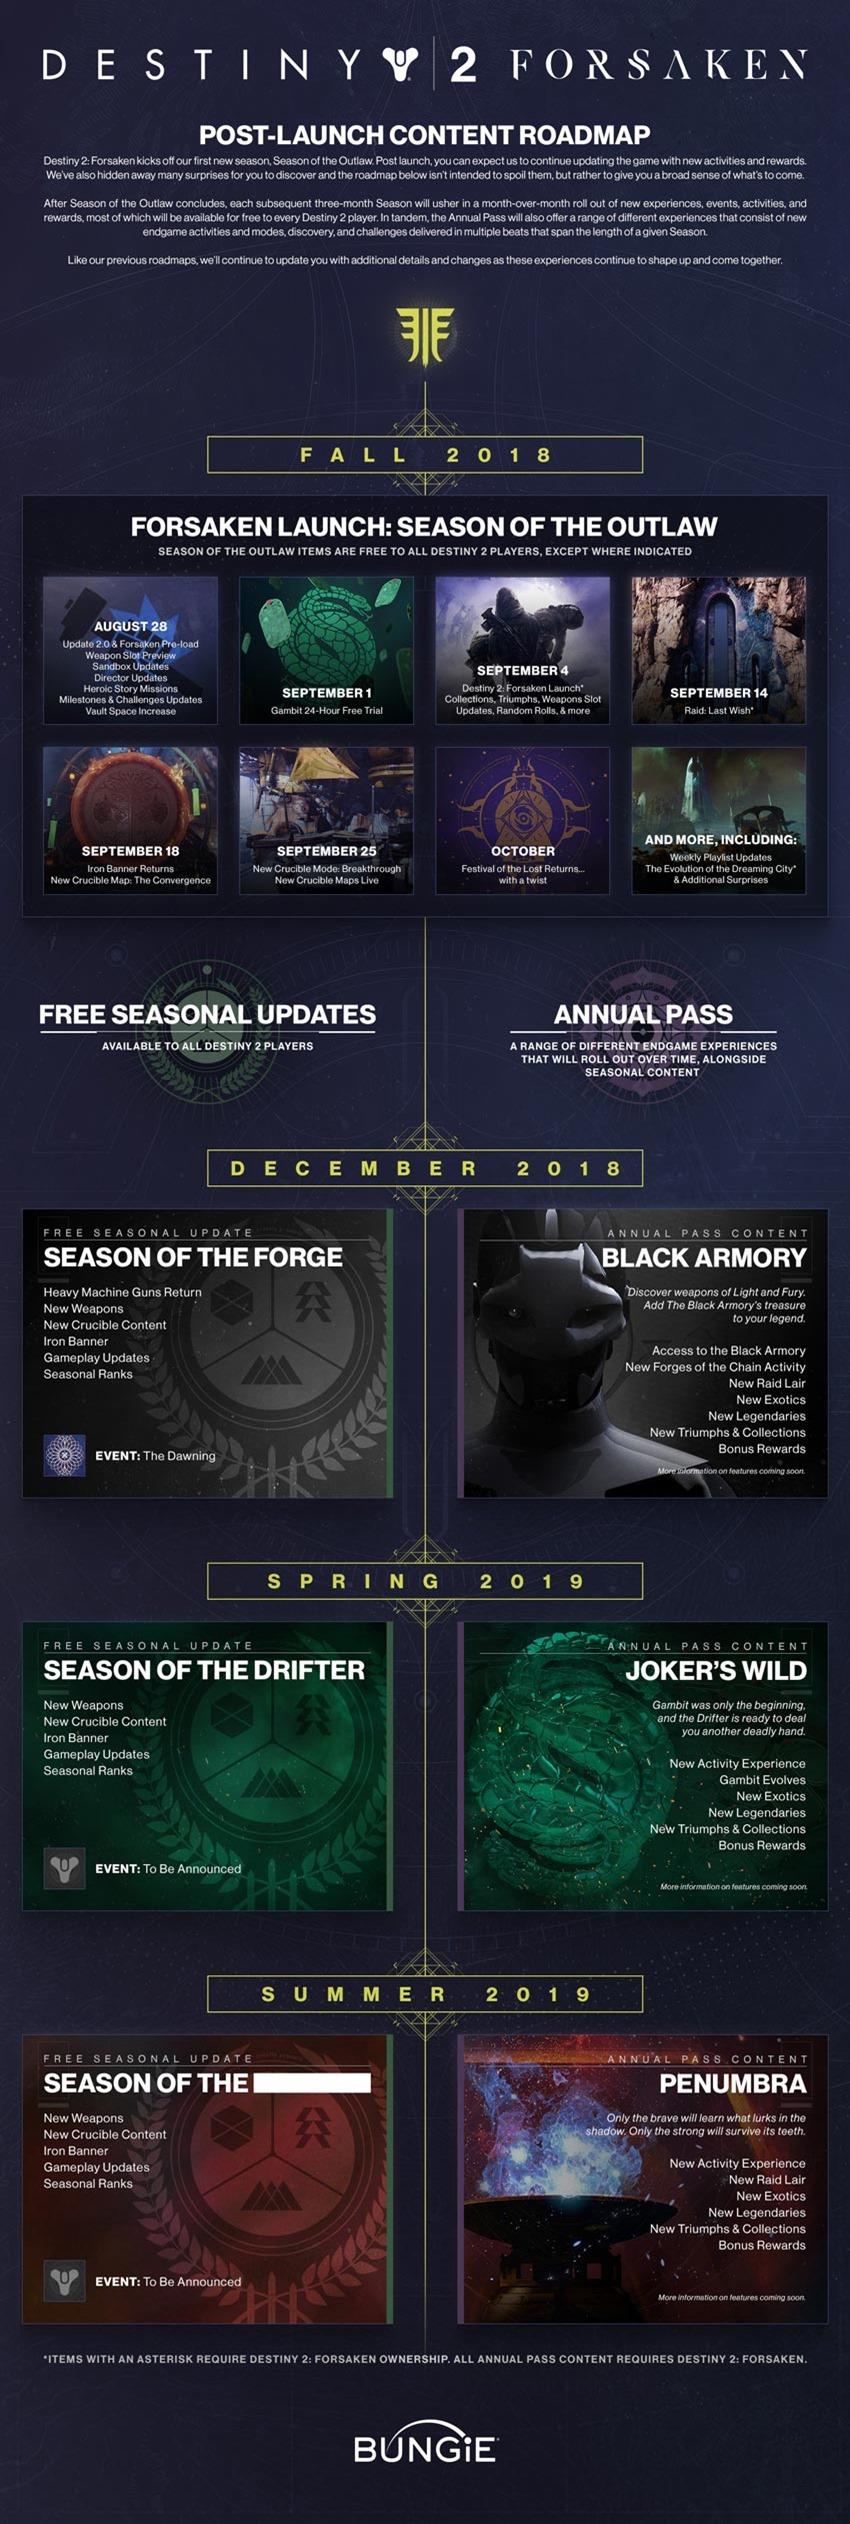 Destiny-2-Forsaken-post-launch-content